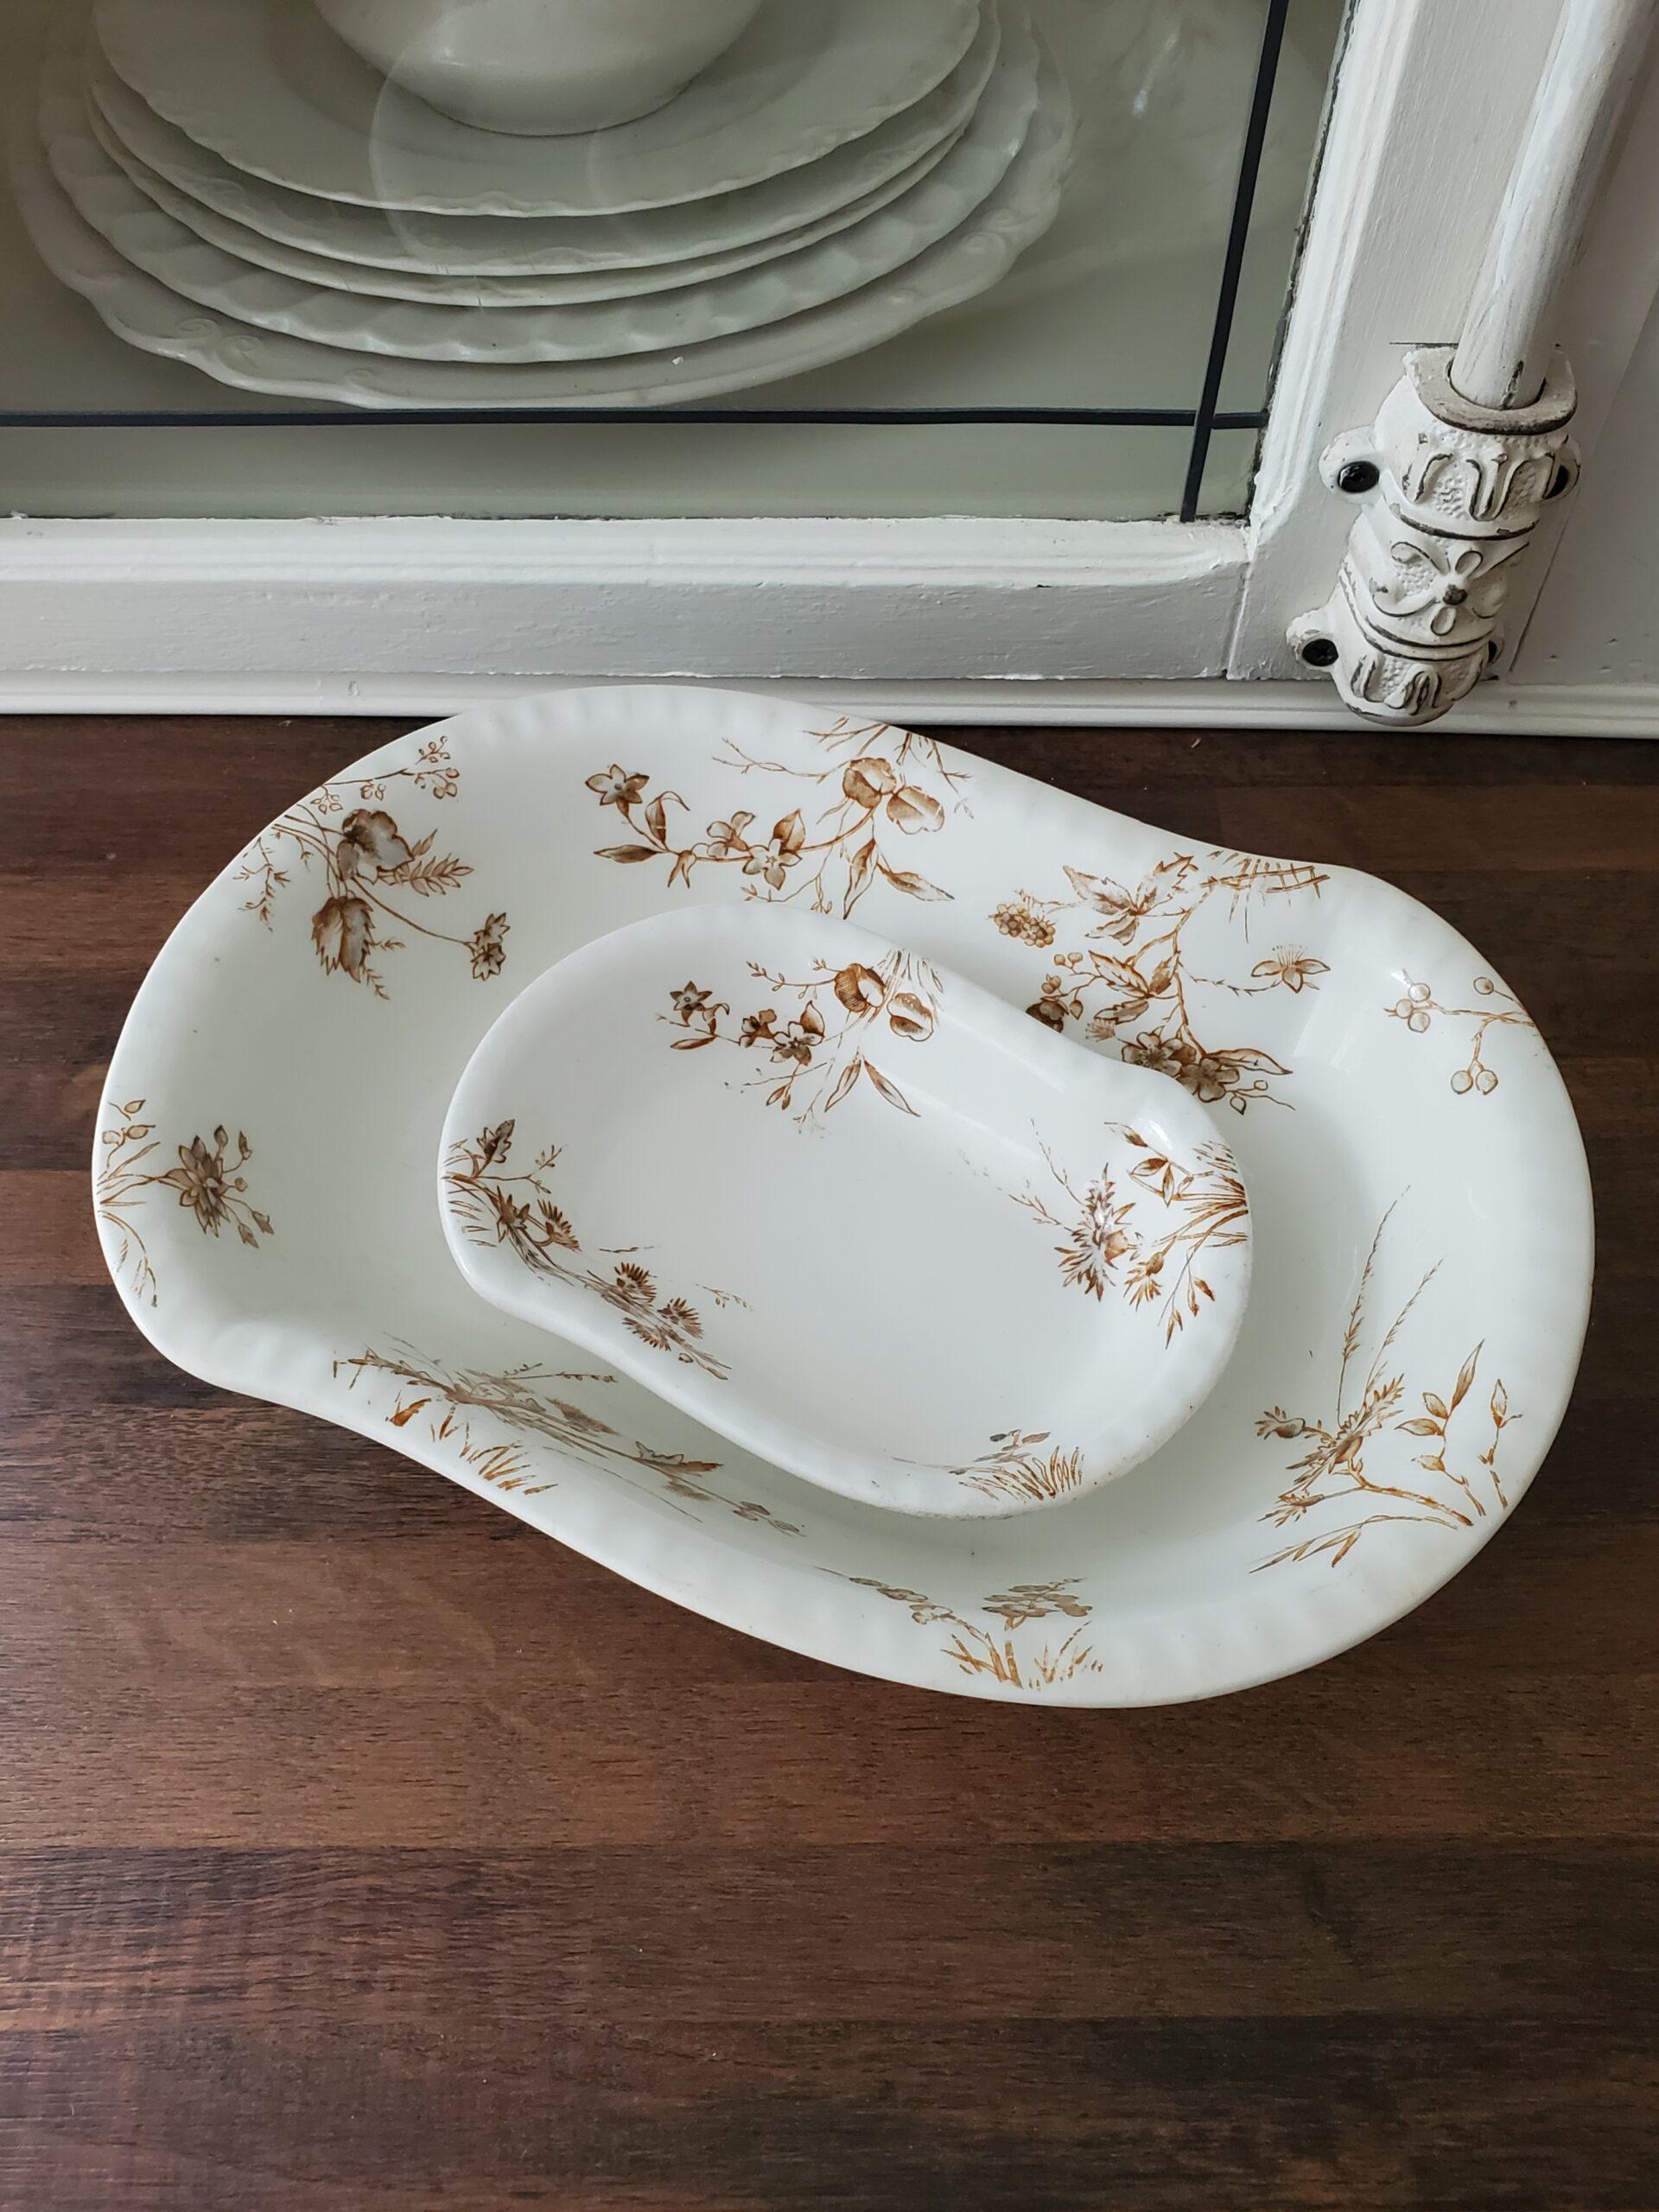 Brown transfeware nesting bowls